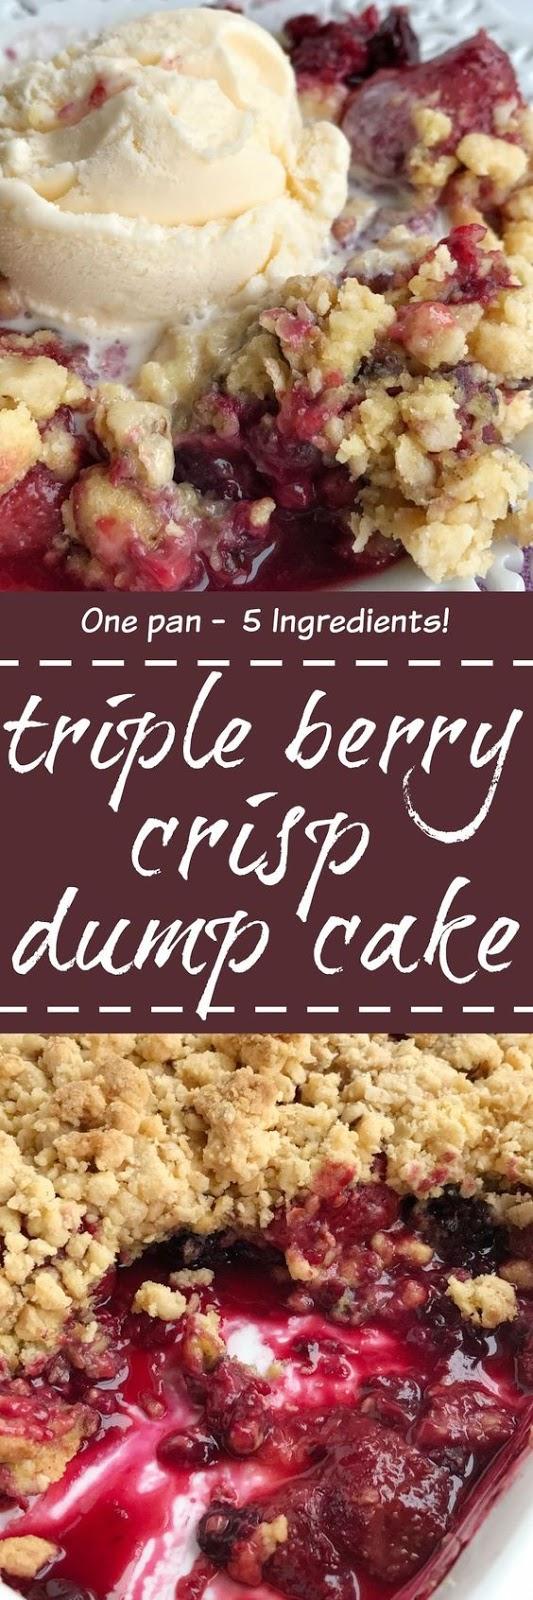 BERRY CRISP DUMP CAKE